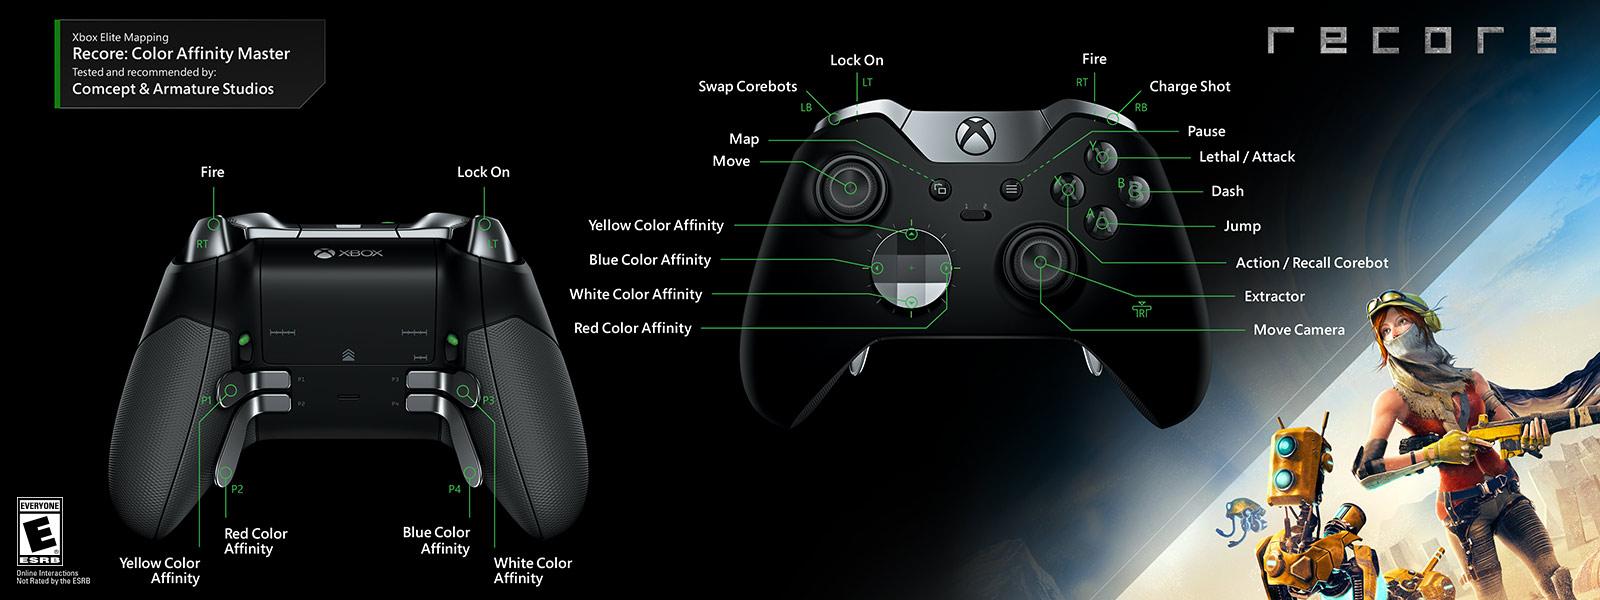 Xbox Controller Diagram In Color Schematics Wiring Diagrams Usb Elite Wireless One Rh Com 360 Outline